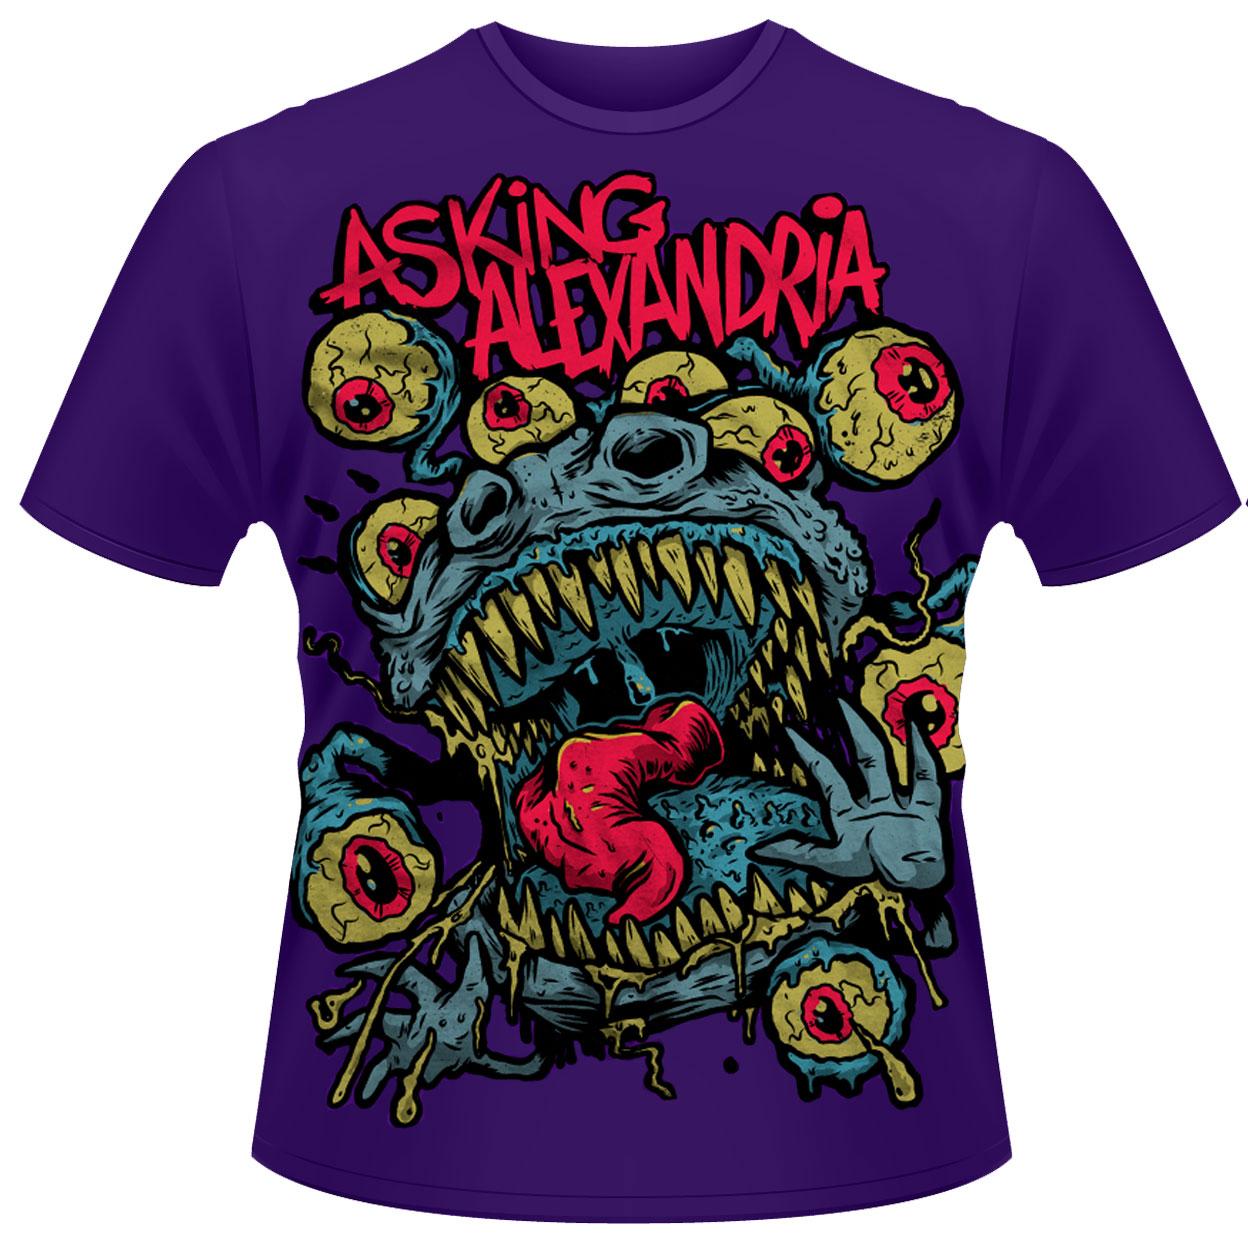 Asking-Alexandria-039-Eyeballs-039-T-Shirt-NEW-amp-OFFICIAL